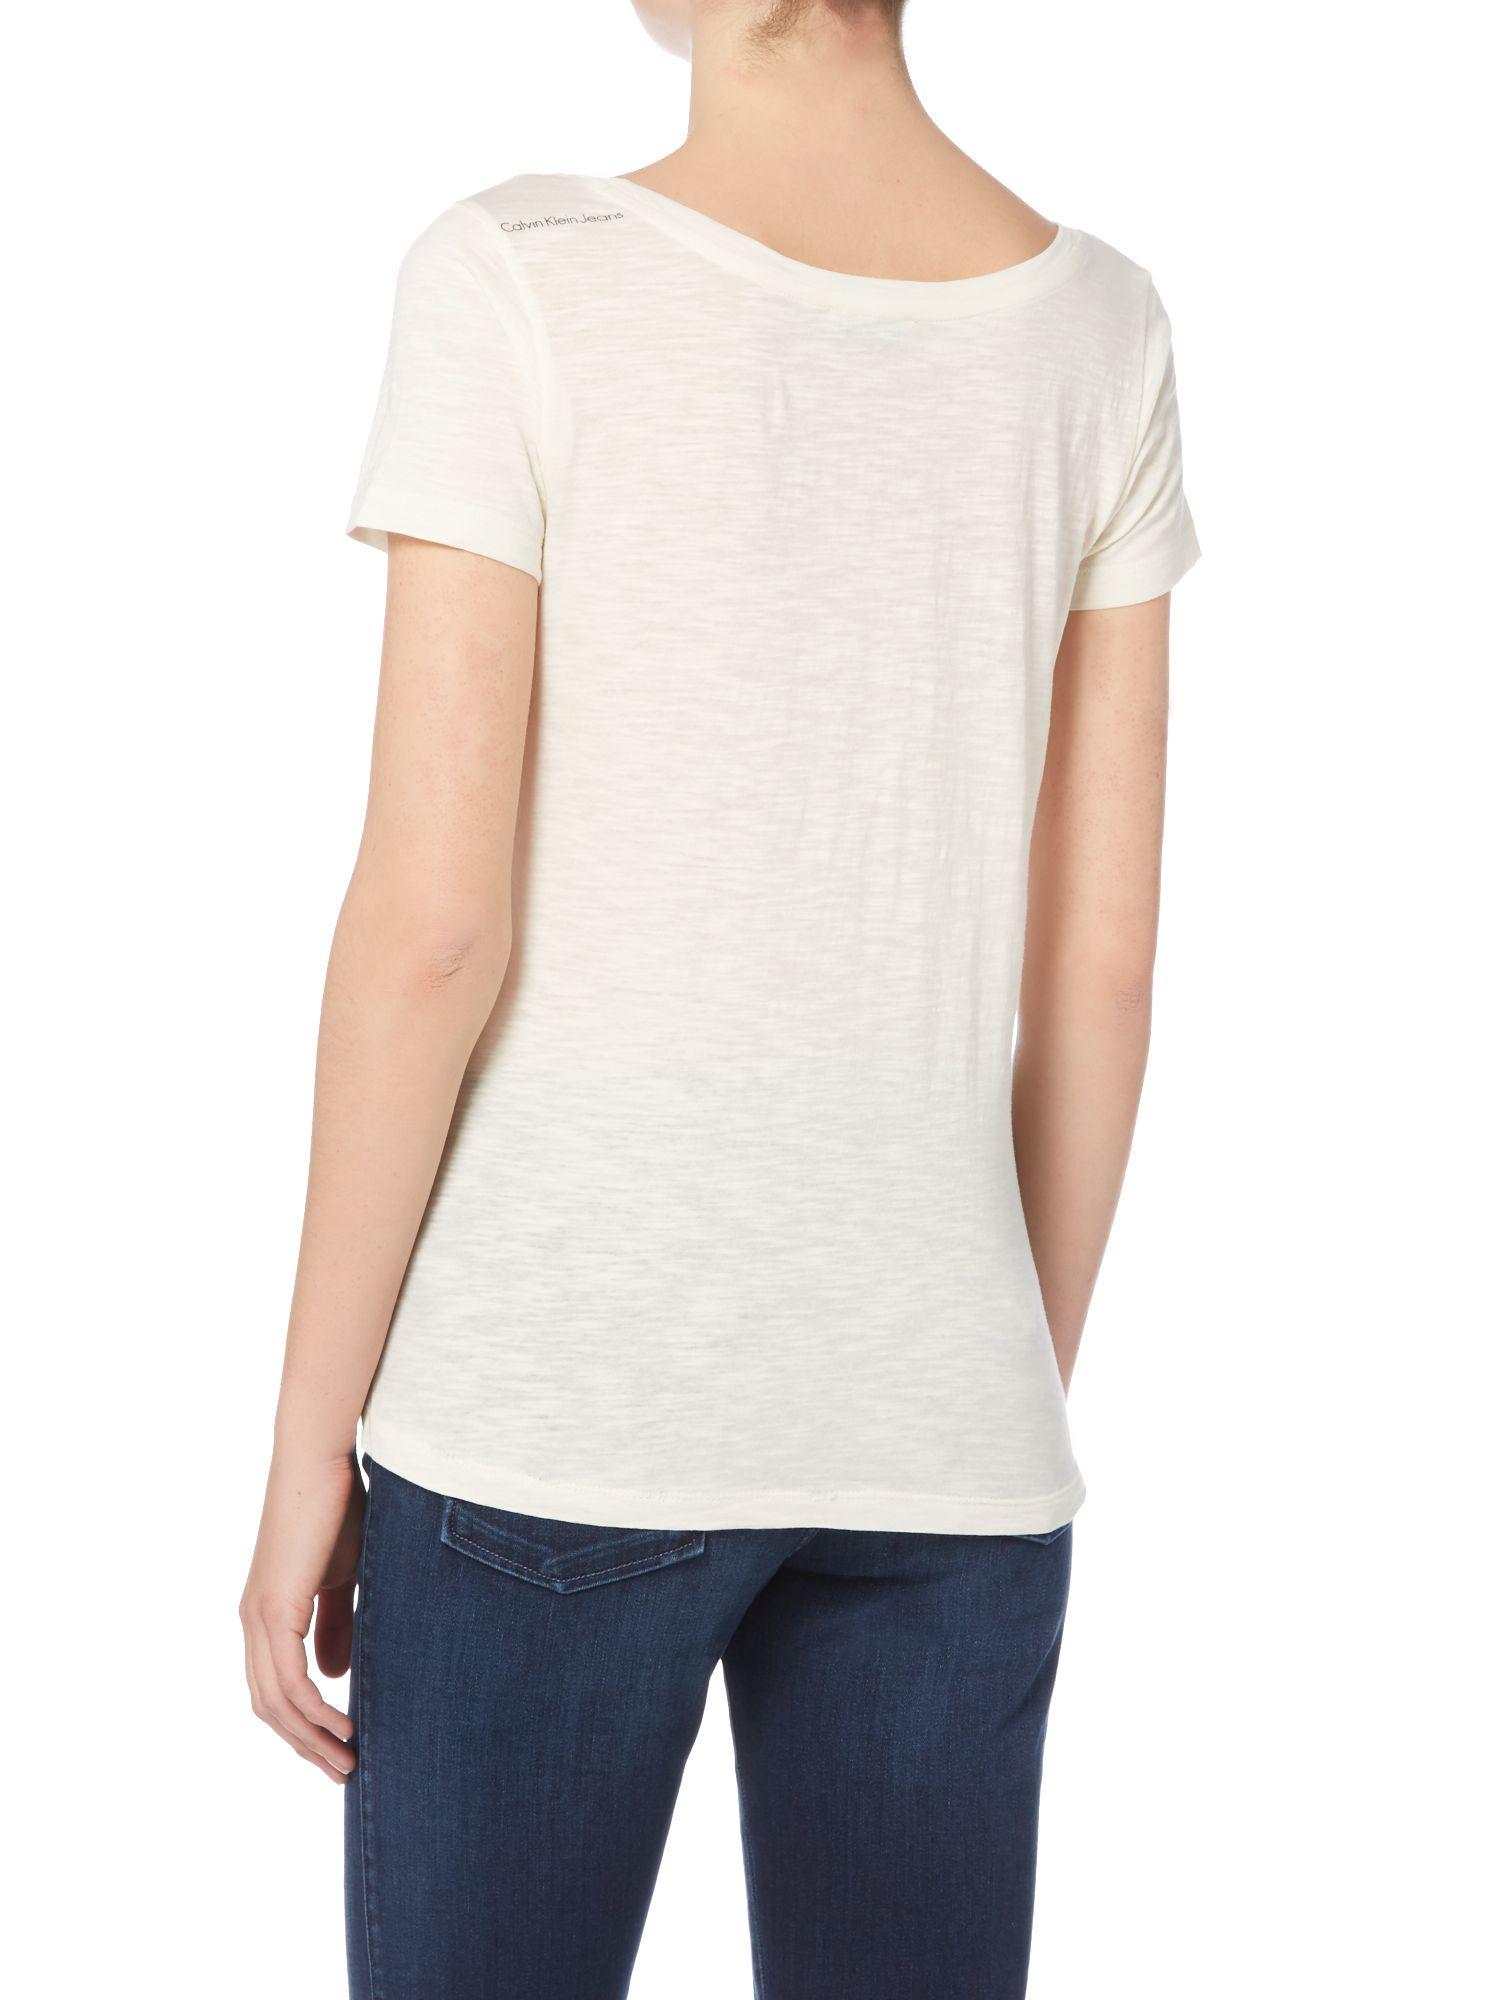 Lyst calvin klein tica print slim fit t shirt in white for Slim fit white t shirt